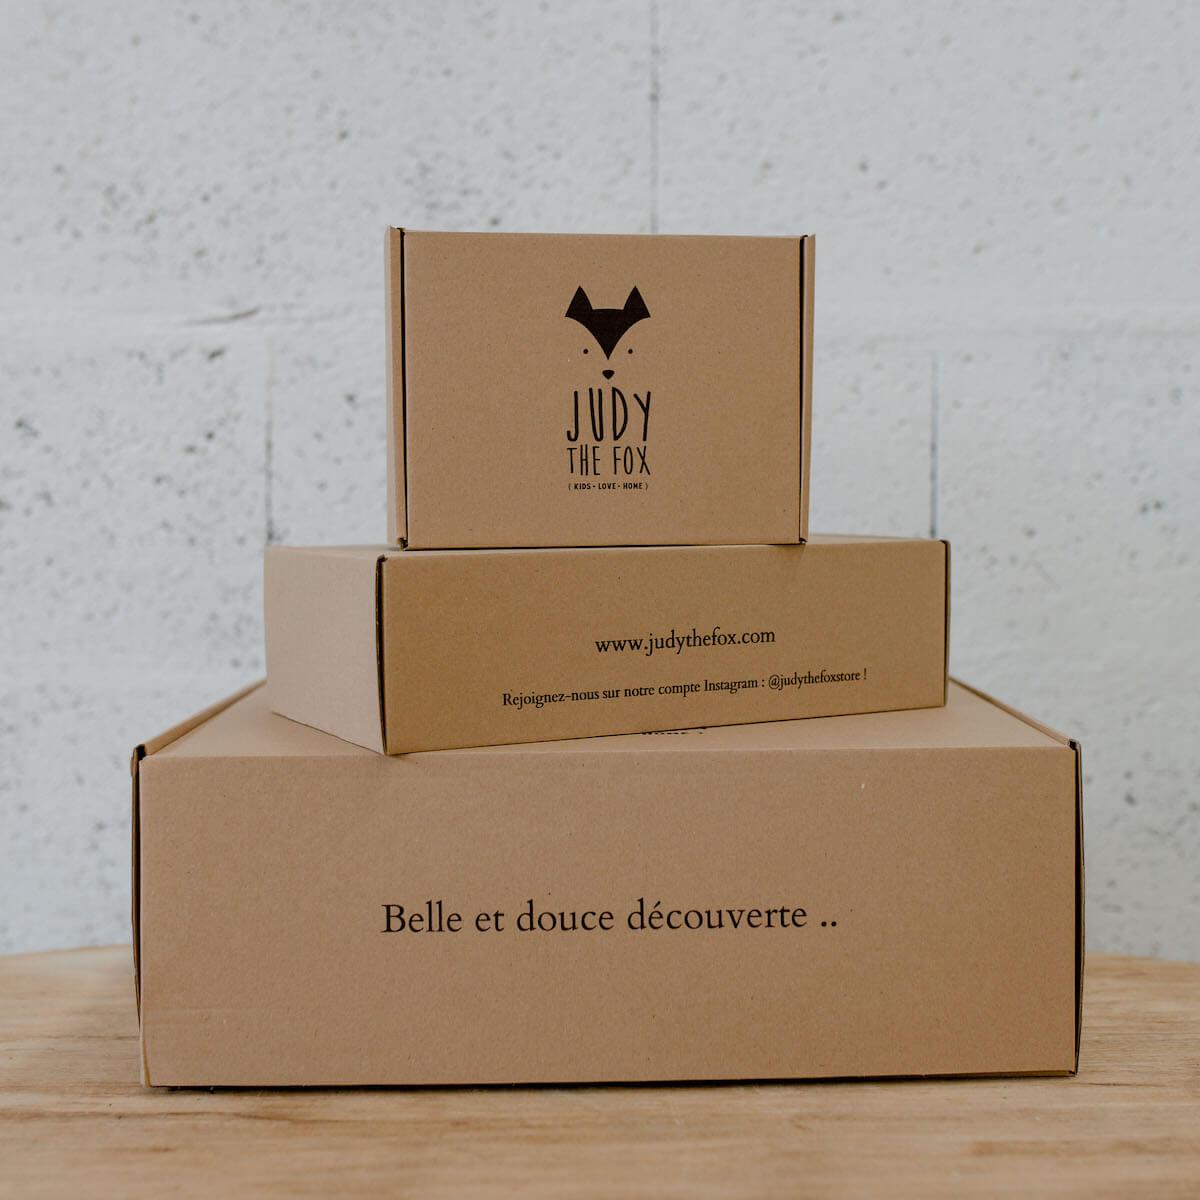 Boîtes d'expédition minimalistes Judy the Fox